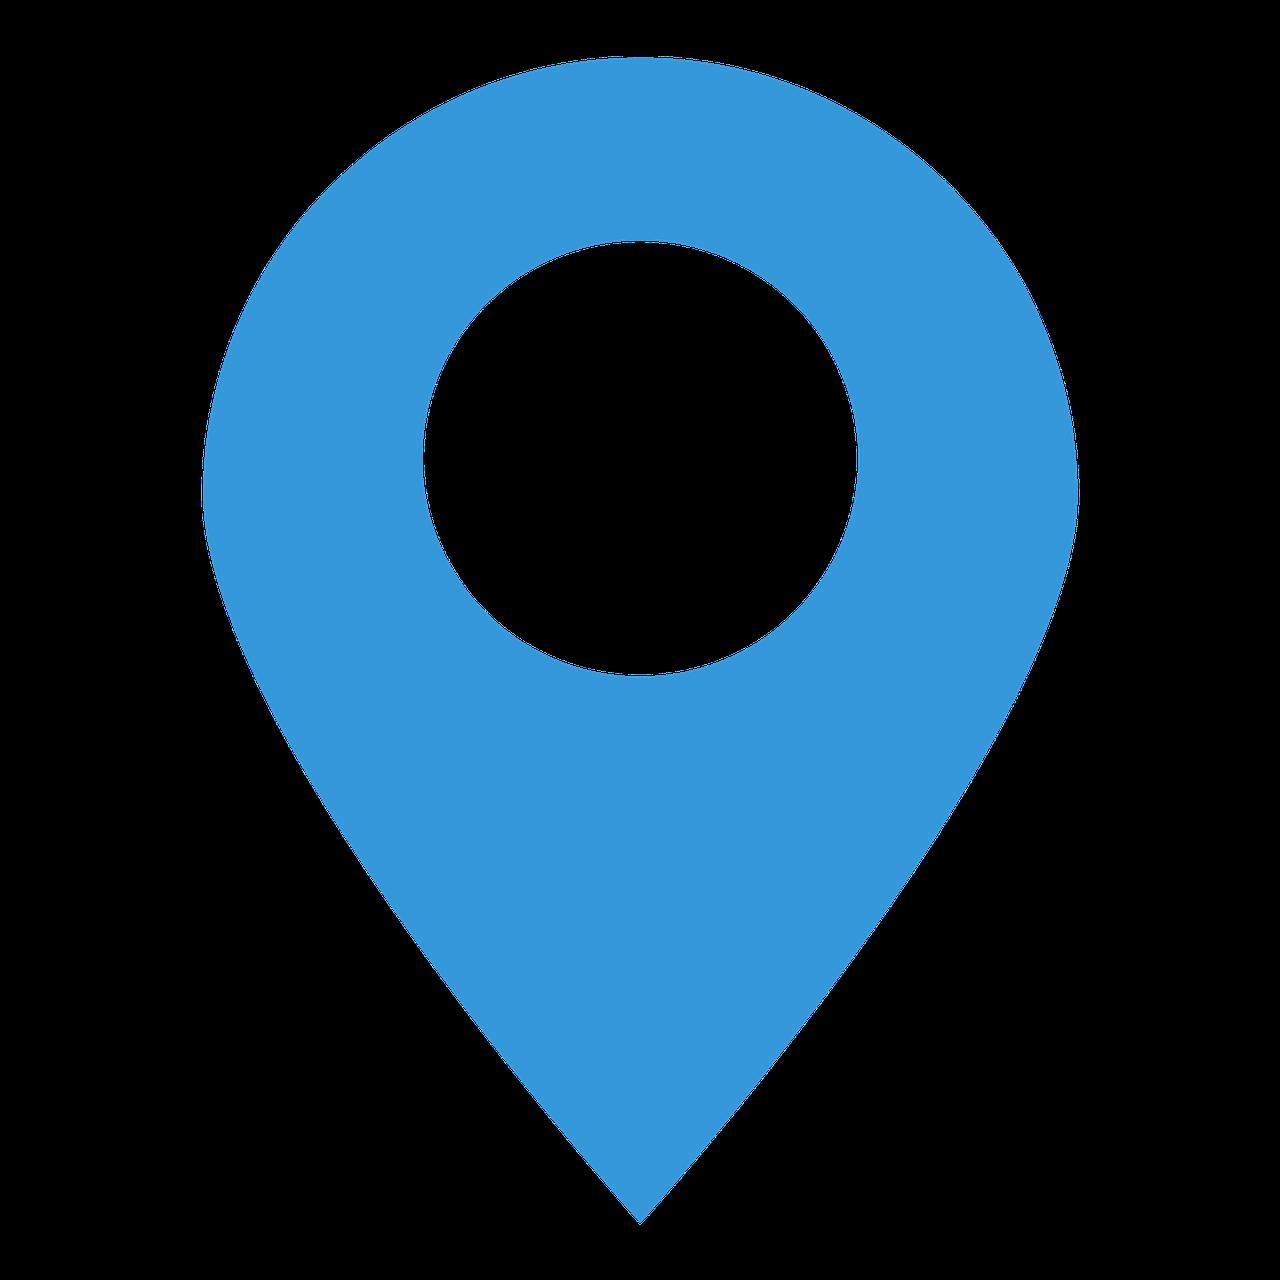 icon, contact, flat-2457945.jpg